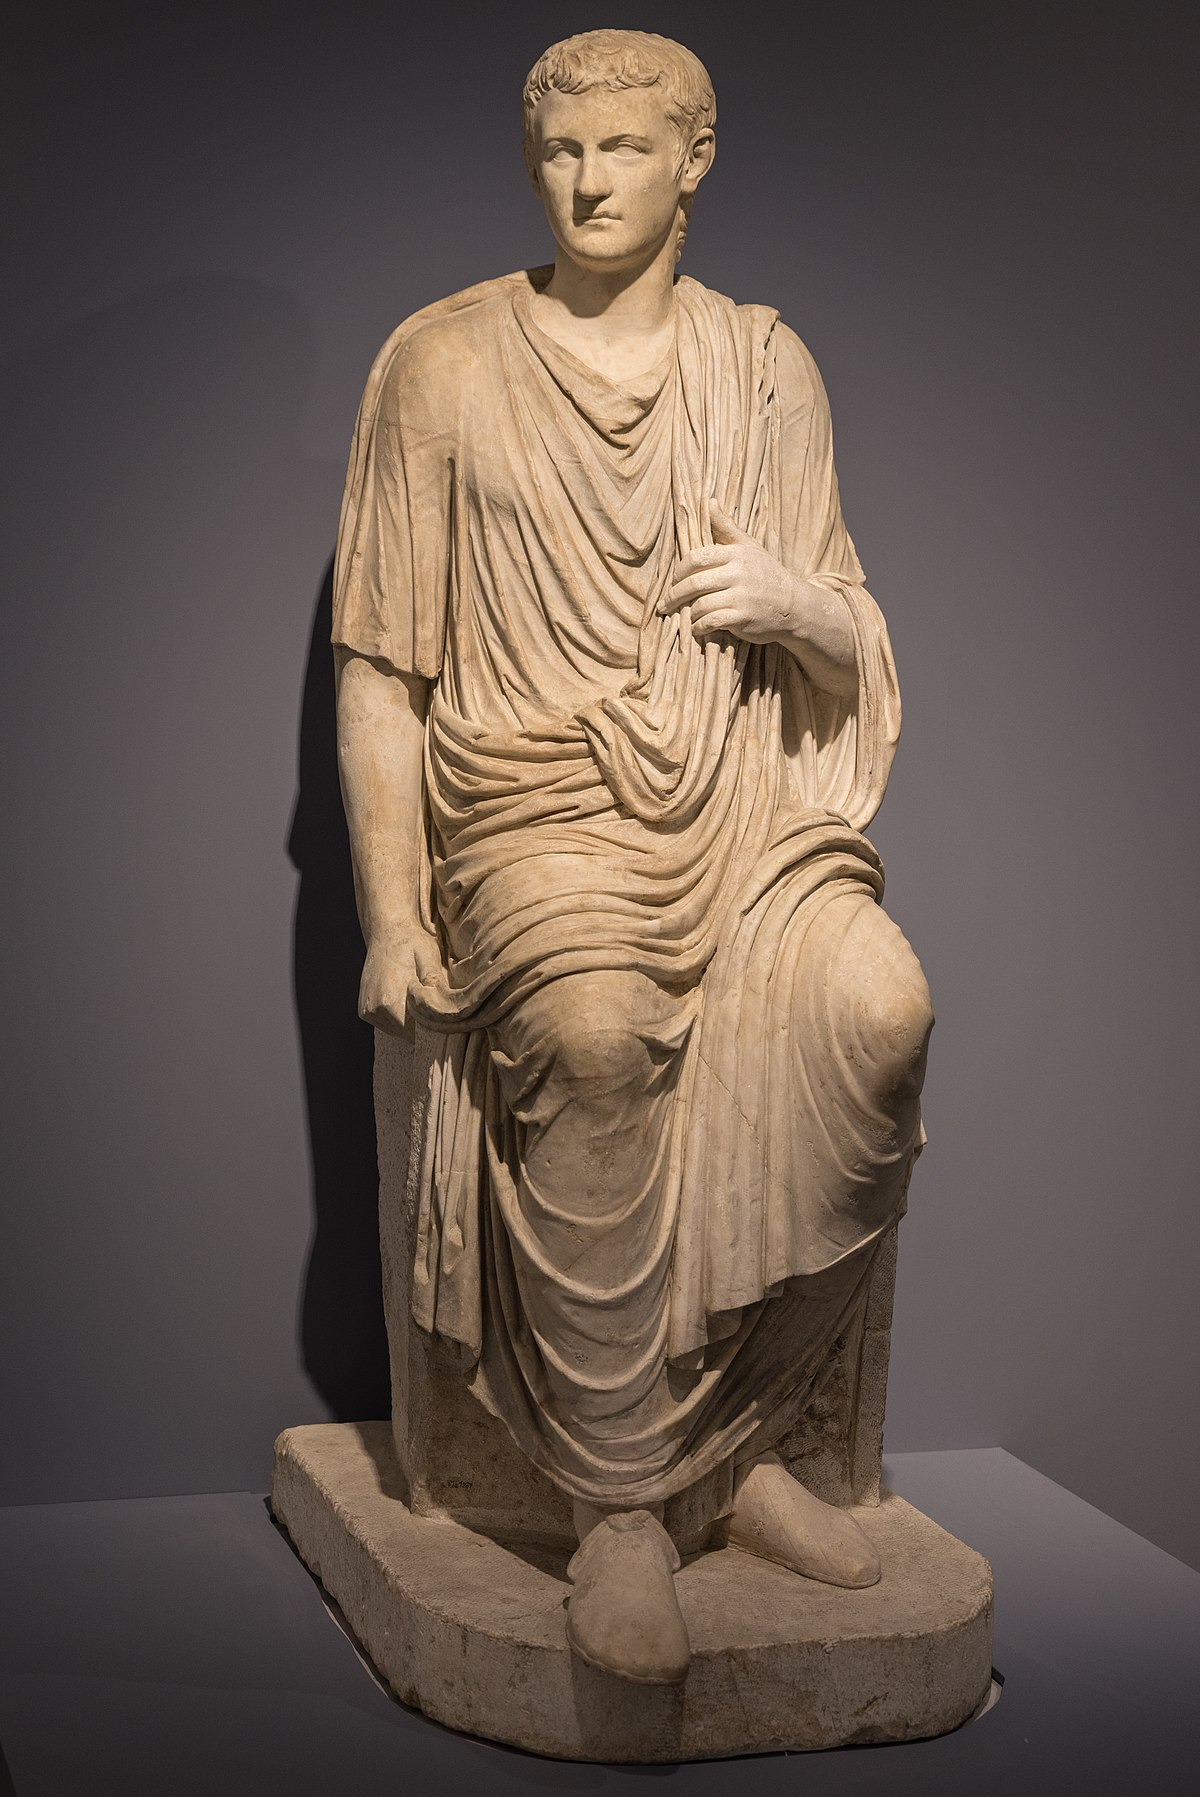 https://upload.wikimedia.org/wikipedia/commons/thumb/6/61/Caligula_03.jpg/1200px-Caligula_03.jpg